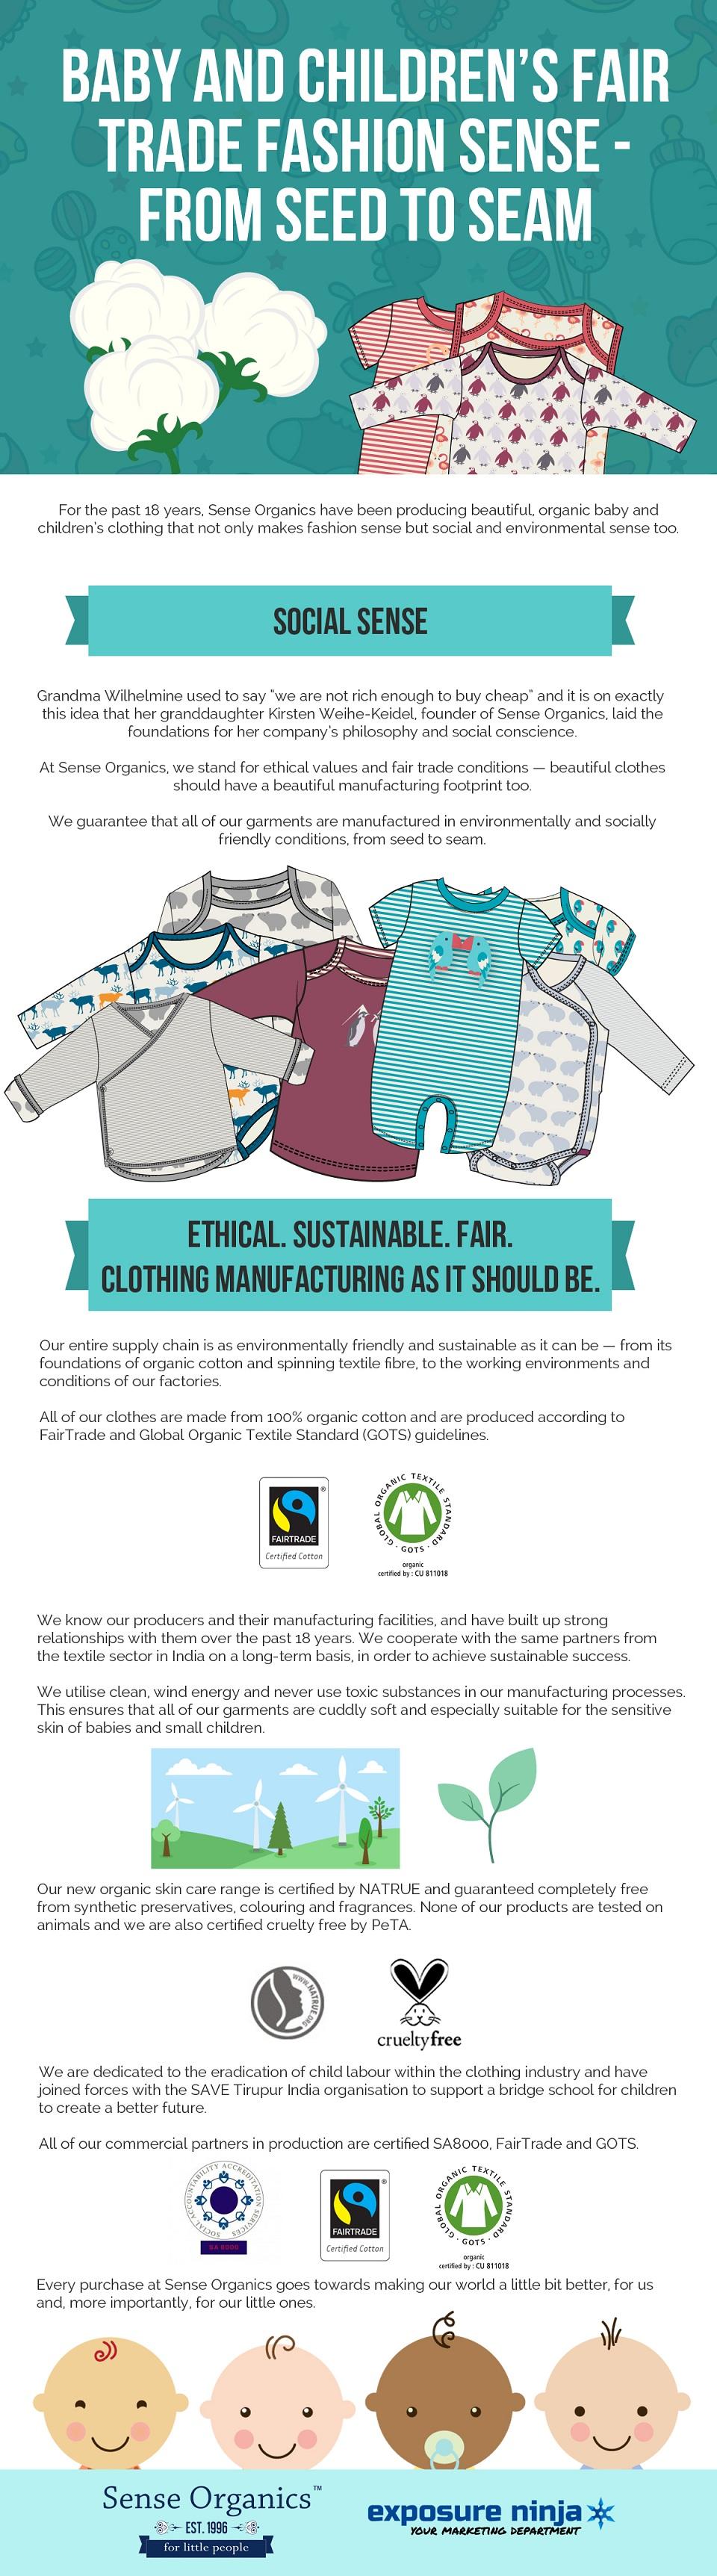 baby and children's fair trade fashion sense - from seed to seam | sense organics